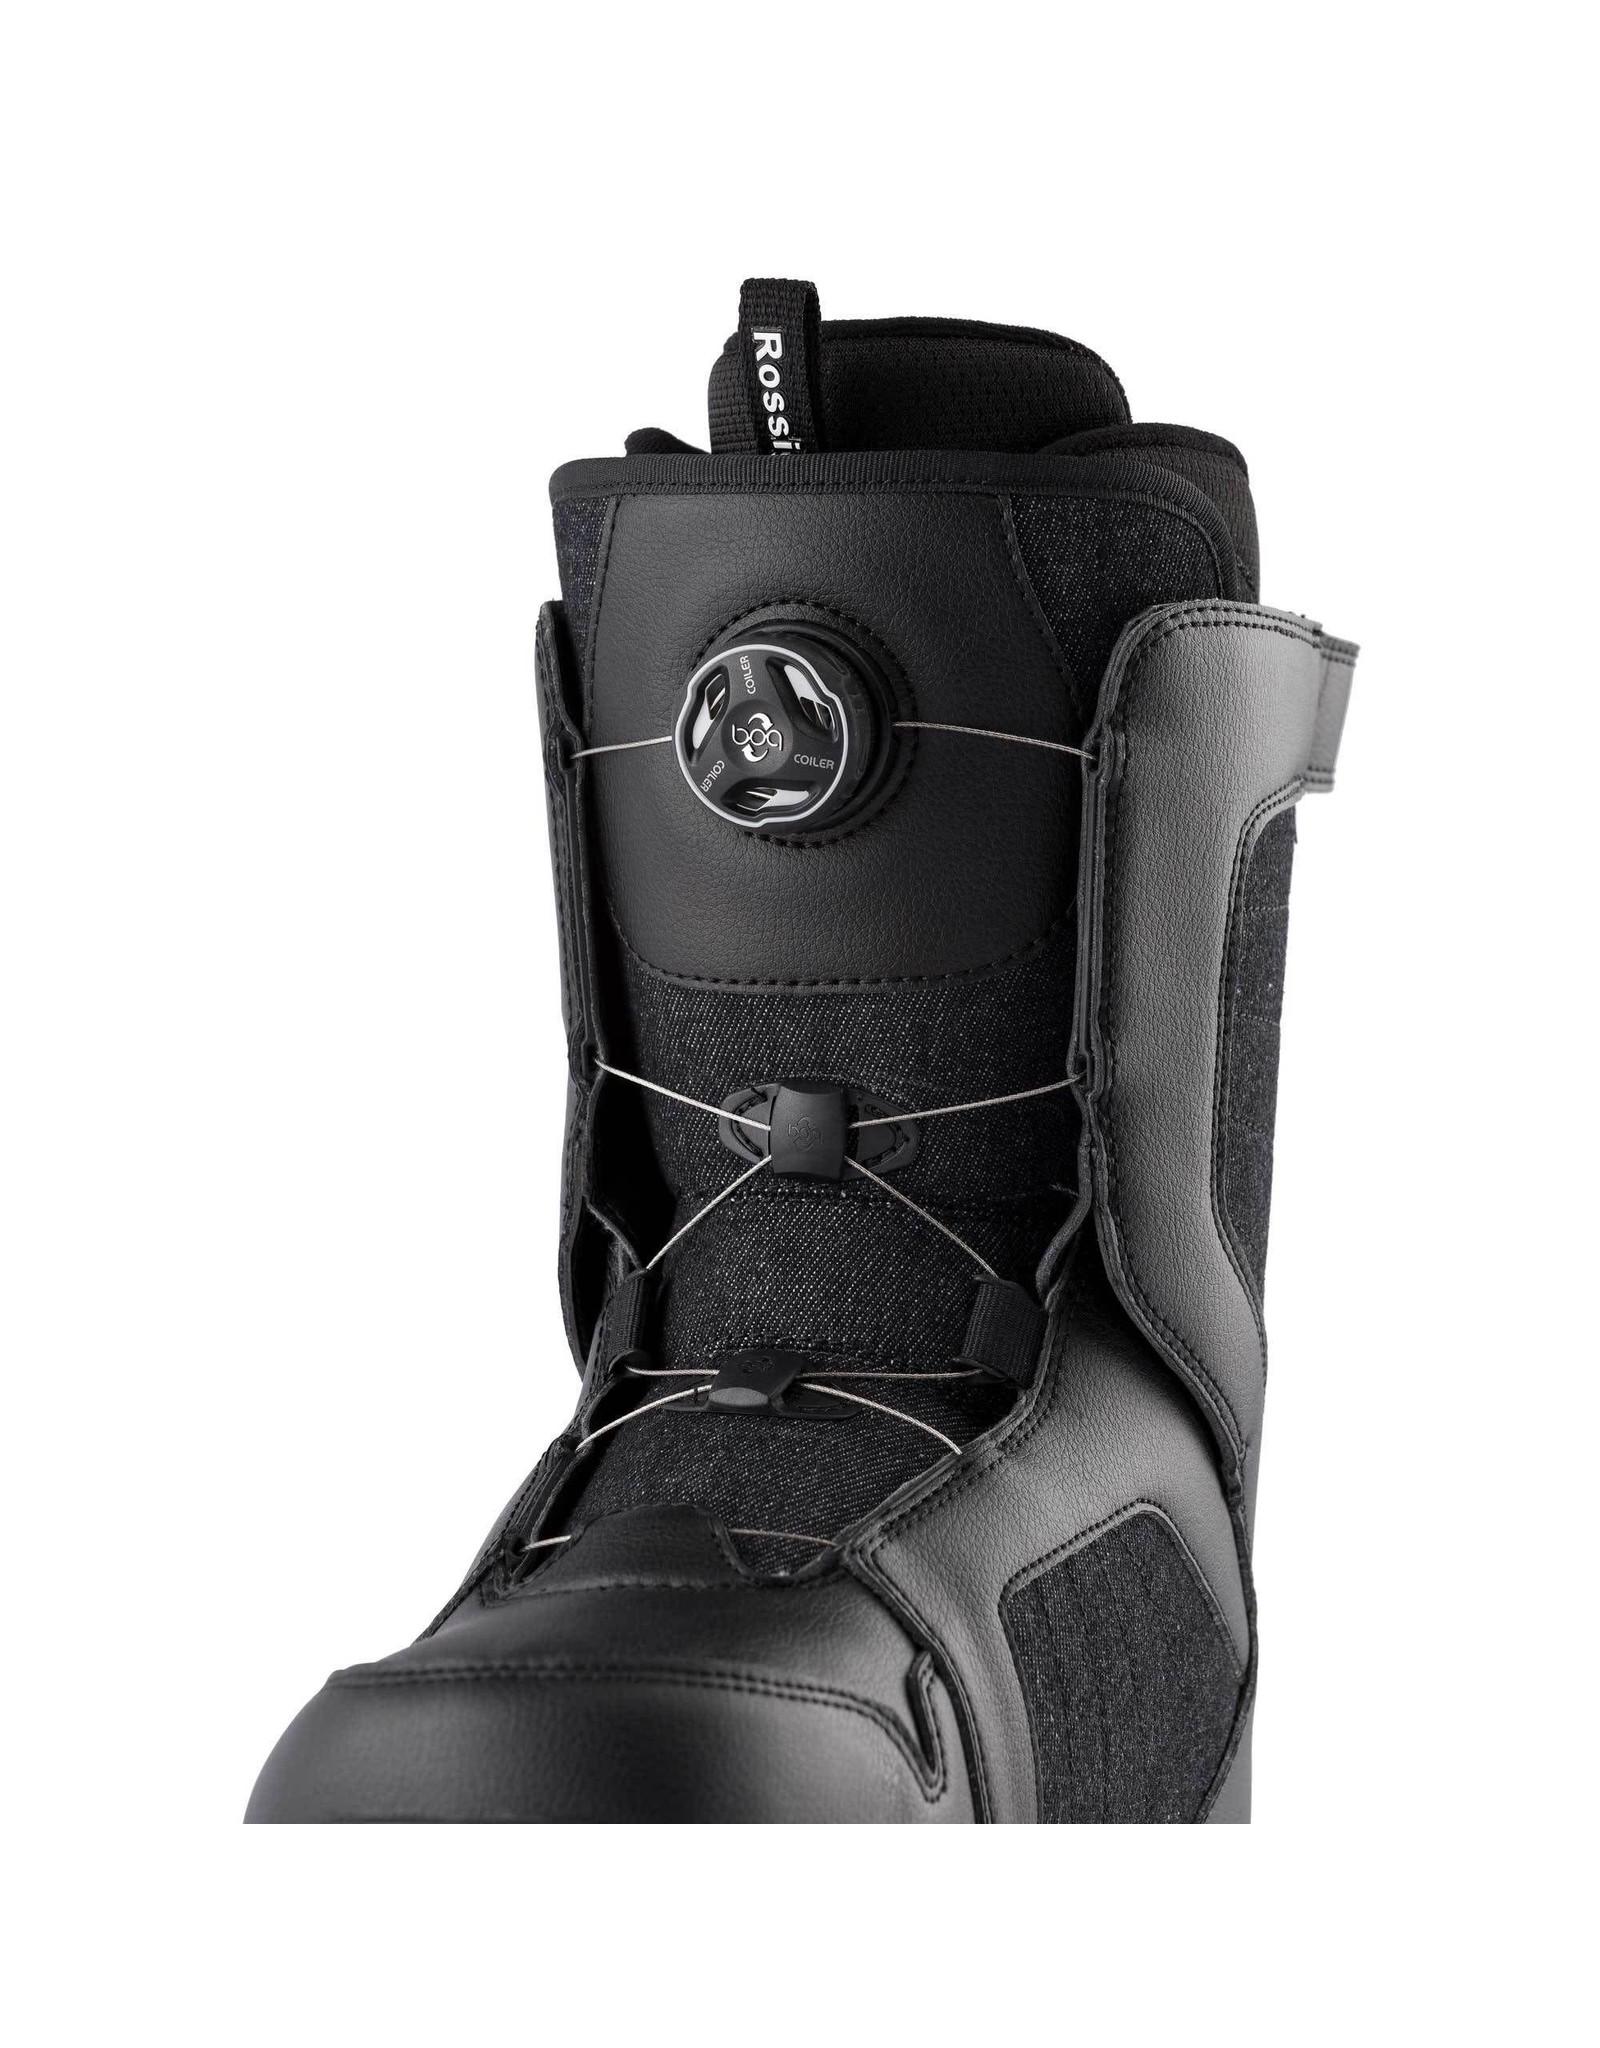 ROSSIGNOL Rossignol Alley boa H3 women snowboard boots 22